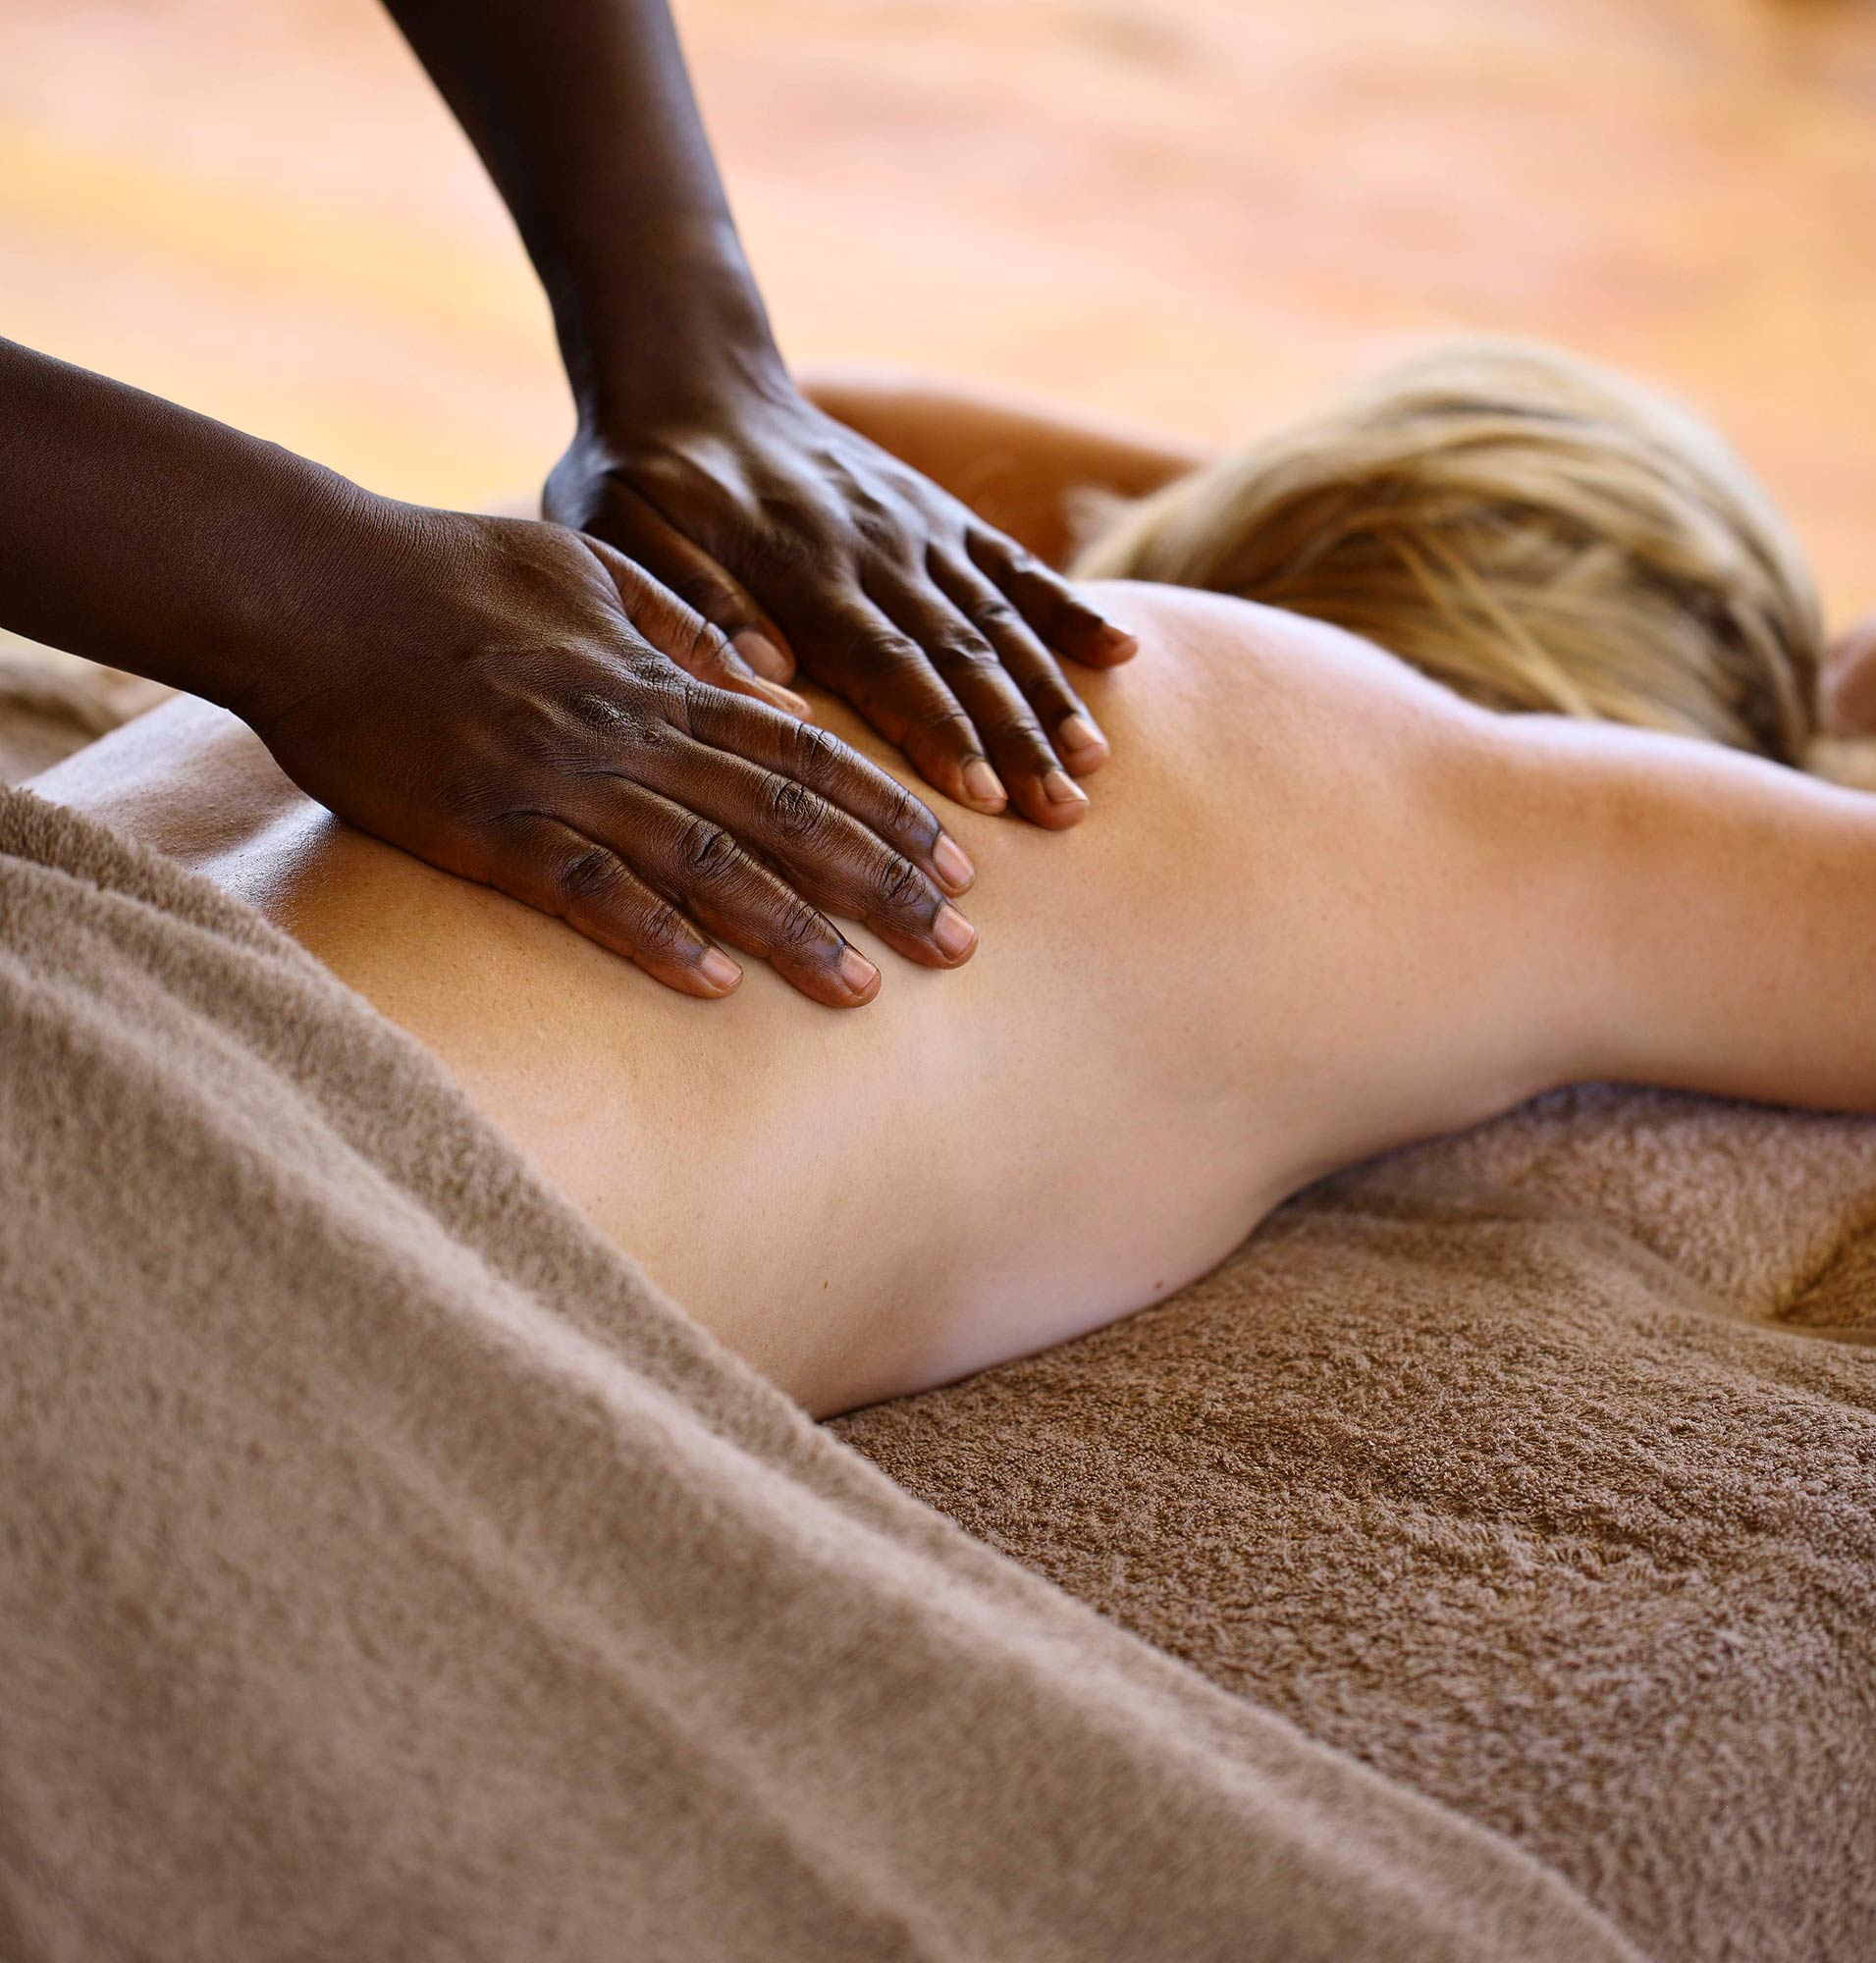 Complimentary massage at Roving Bushtops